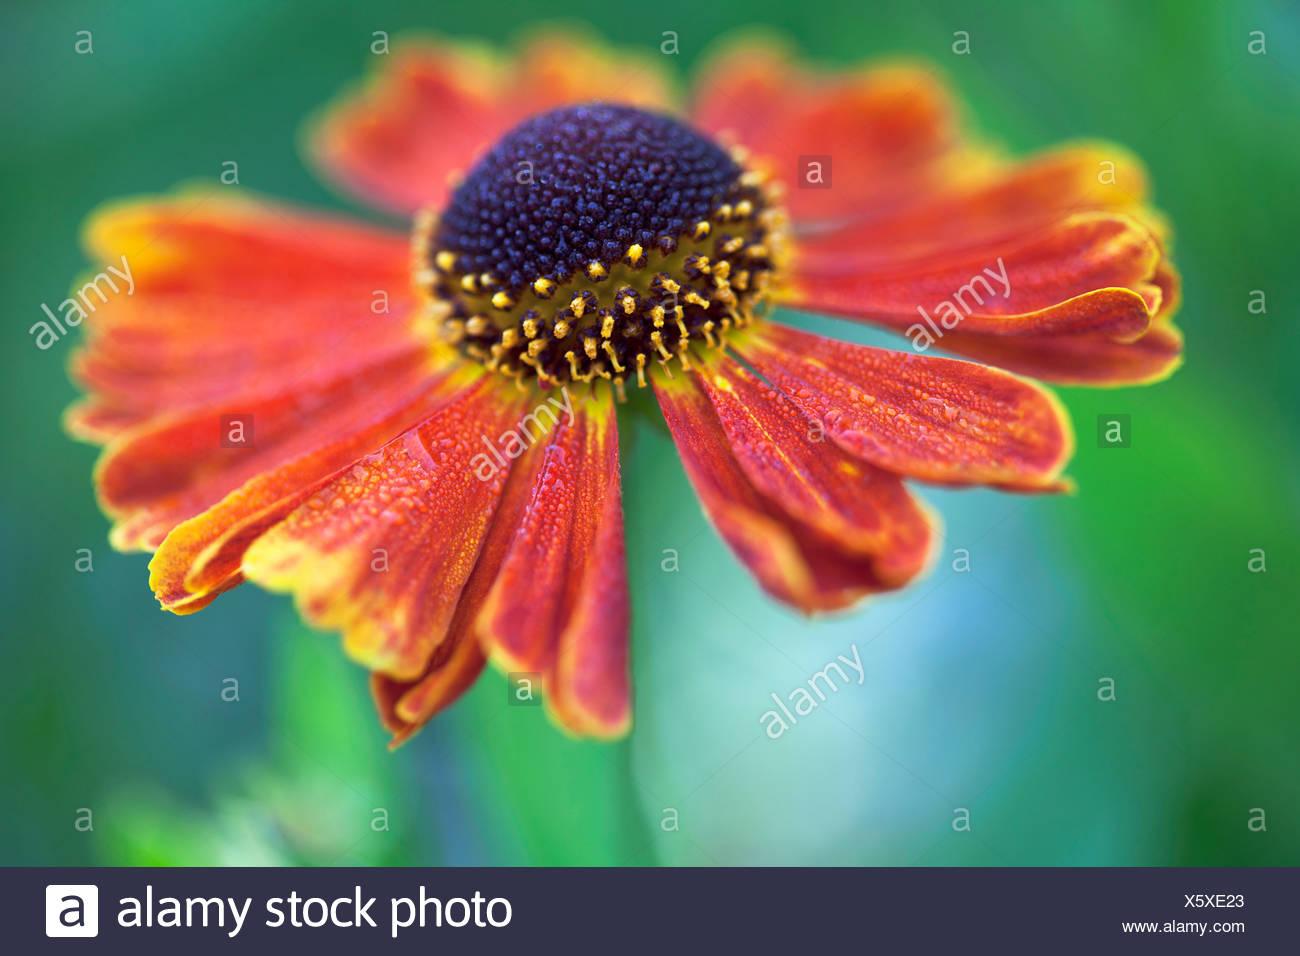 Helen's flower, Sneezeweed, Helenium 'Moerheim bellezza', arancione. Immagini Stock